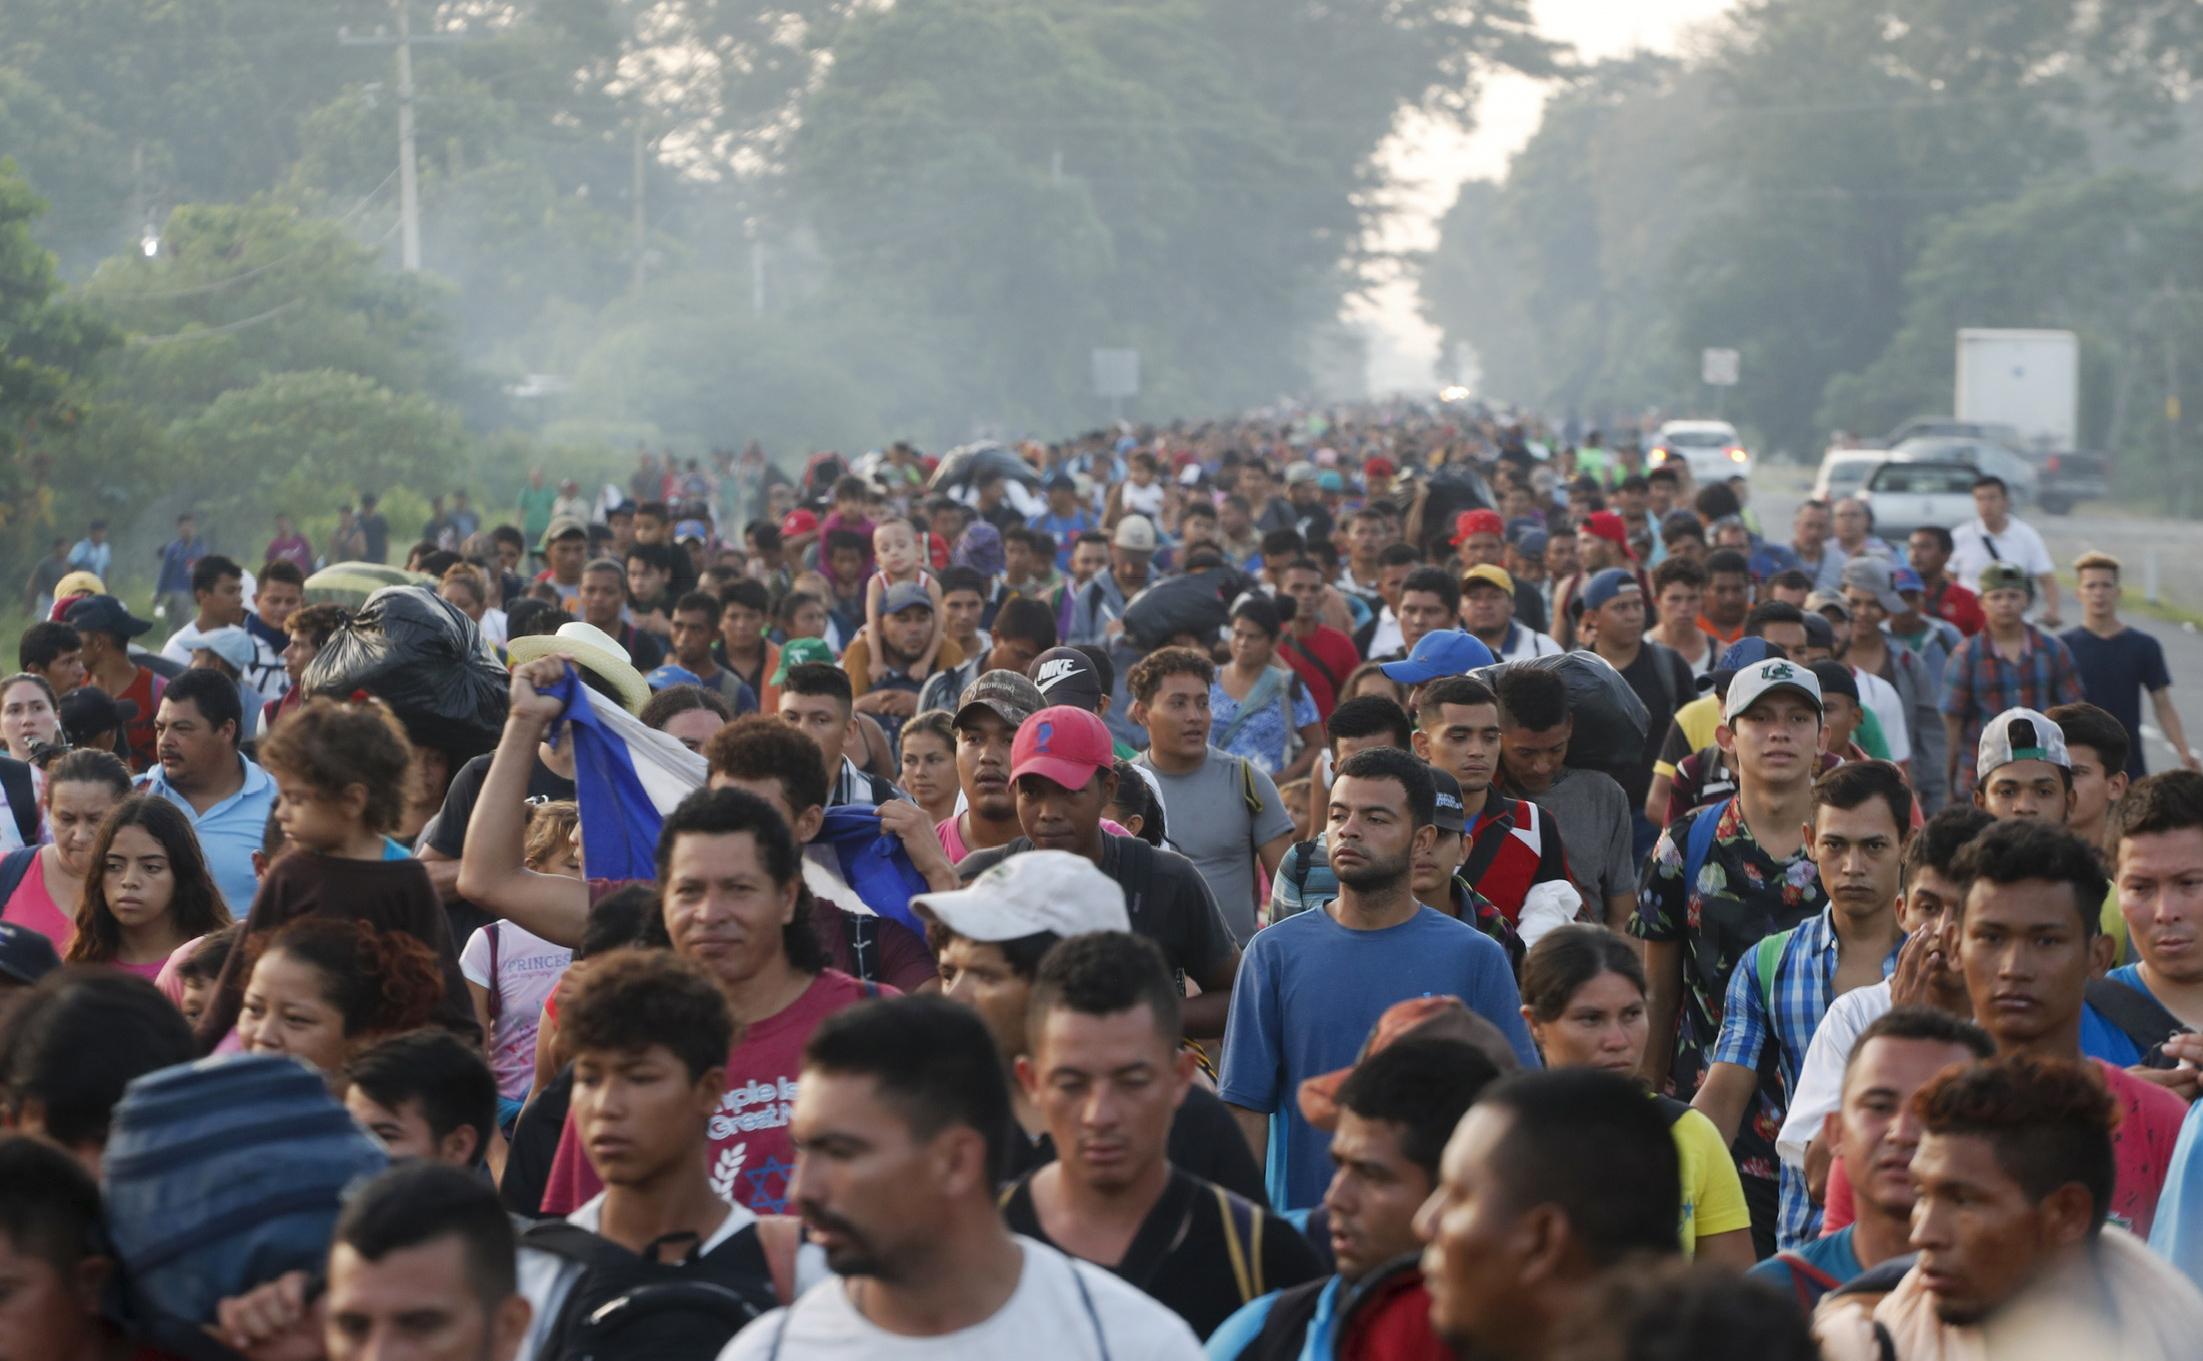 Central_America_Migrant_Caravan_98149-159532.jpg81107943